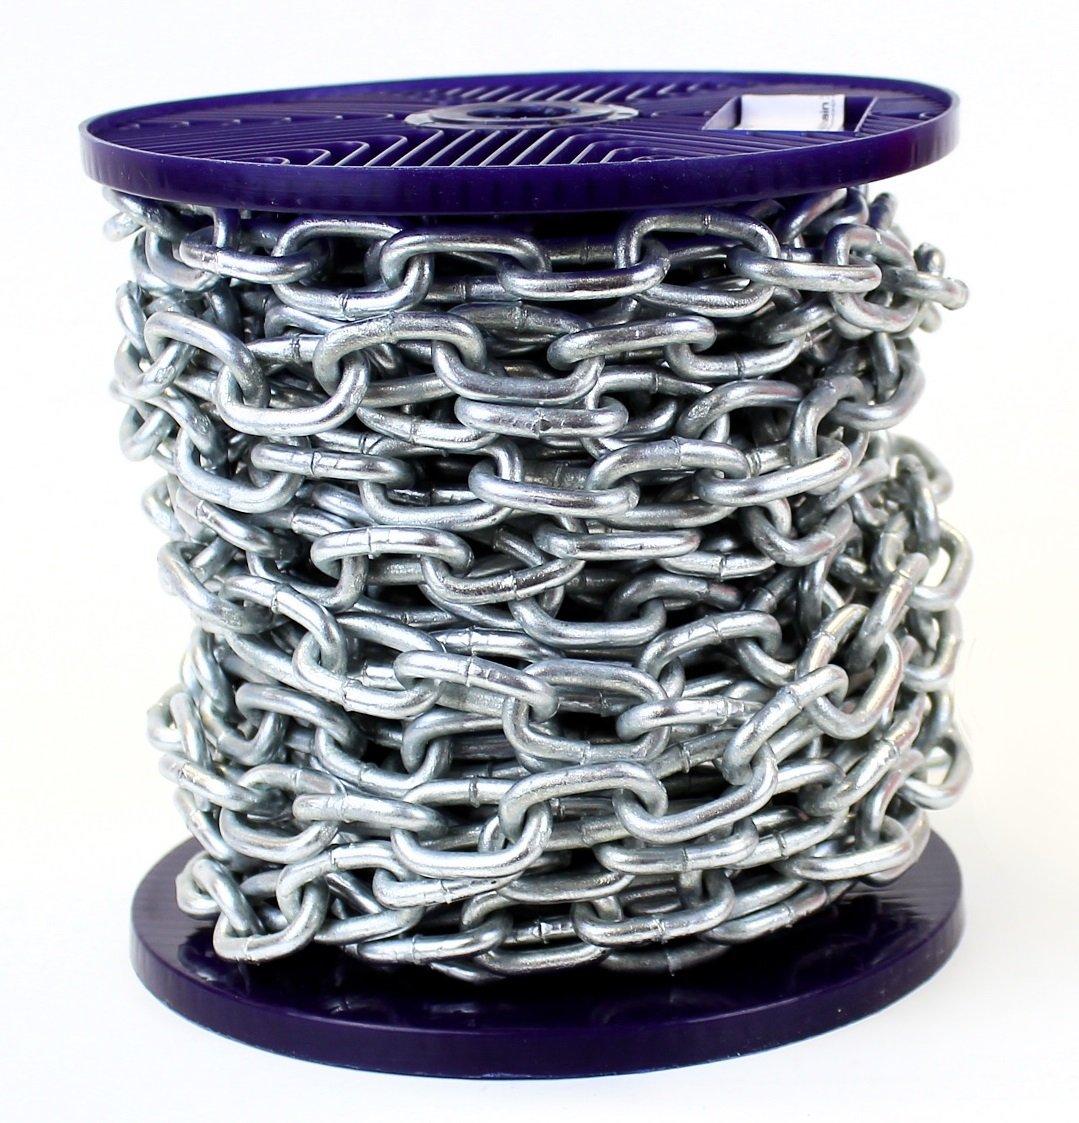 Strong Hot Dipped Galvanized Heavy Duty Steel Chain 5MM 7 Metre Custom Cut Length